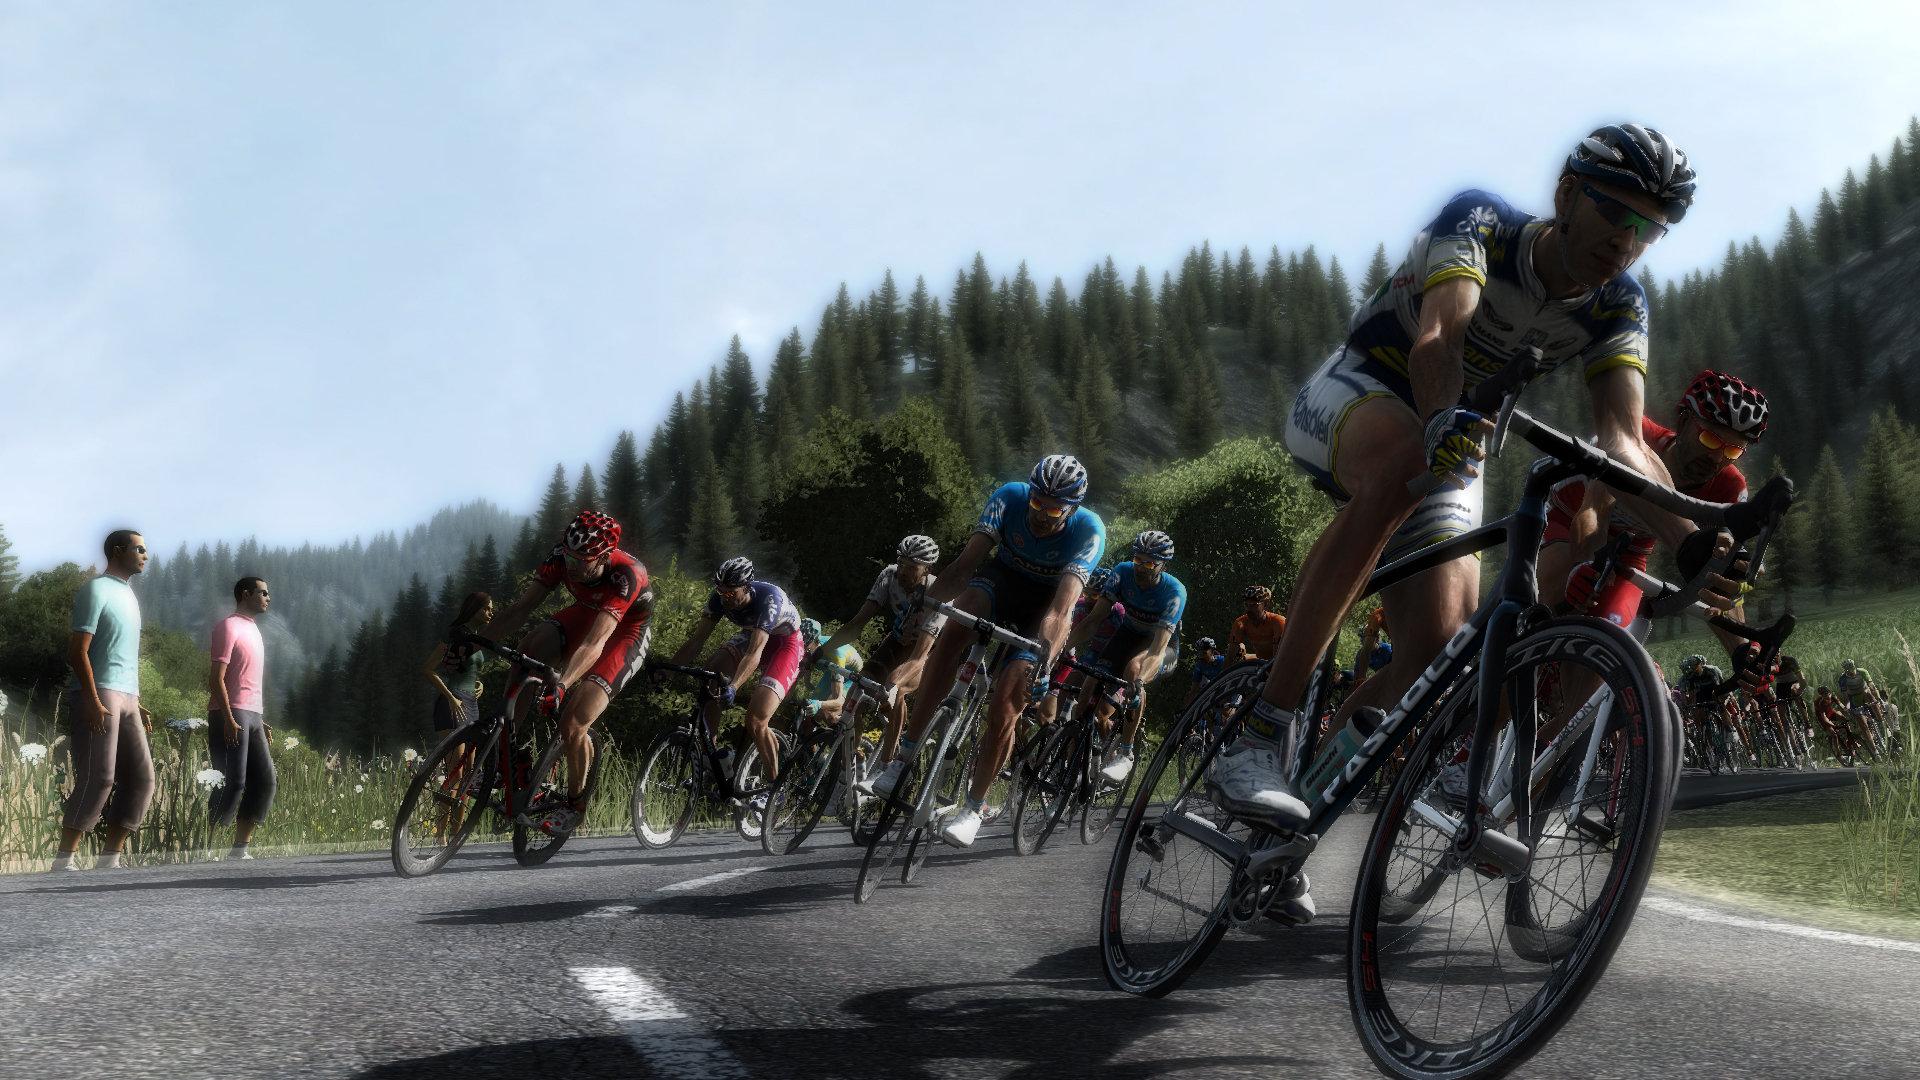 Tour de France 2012 desktop wallpaper 1 of 4 Video 1920x1080